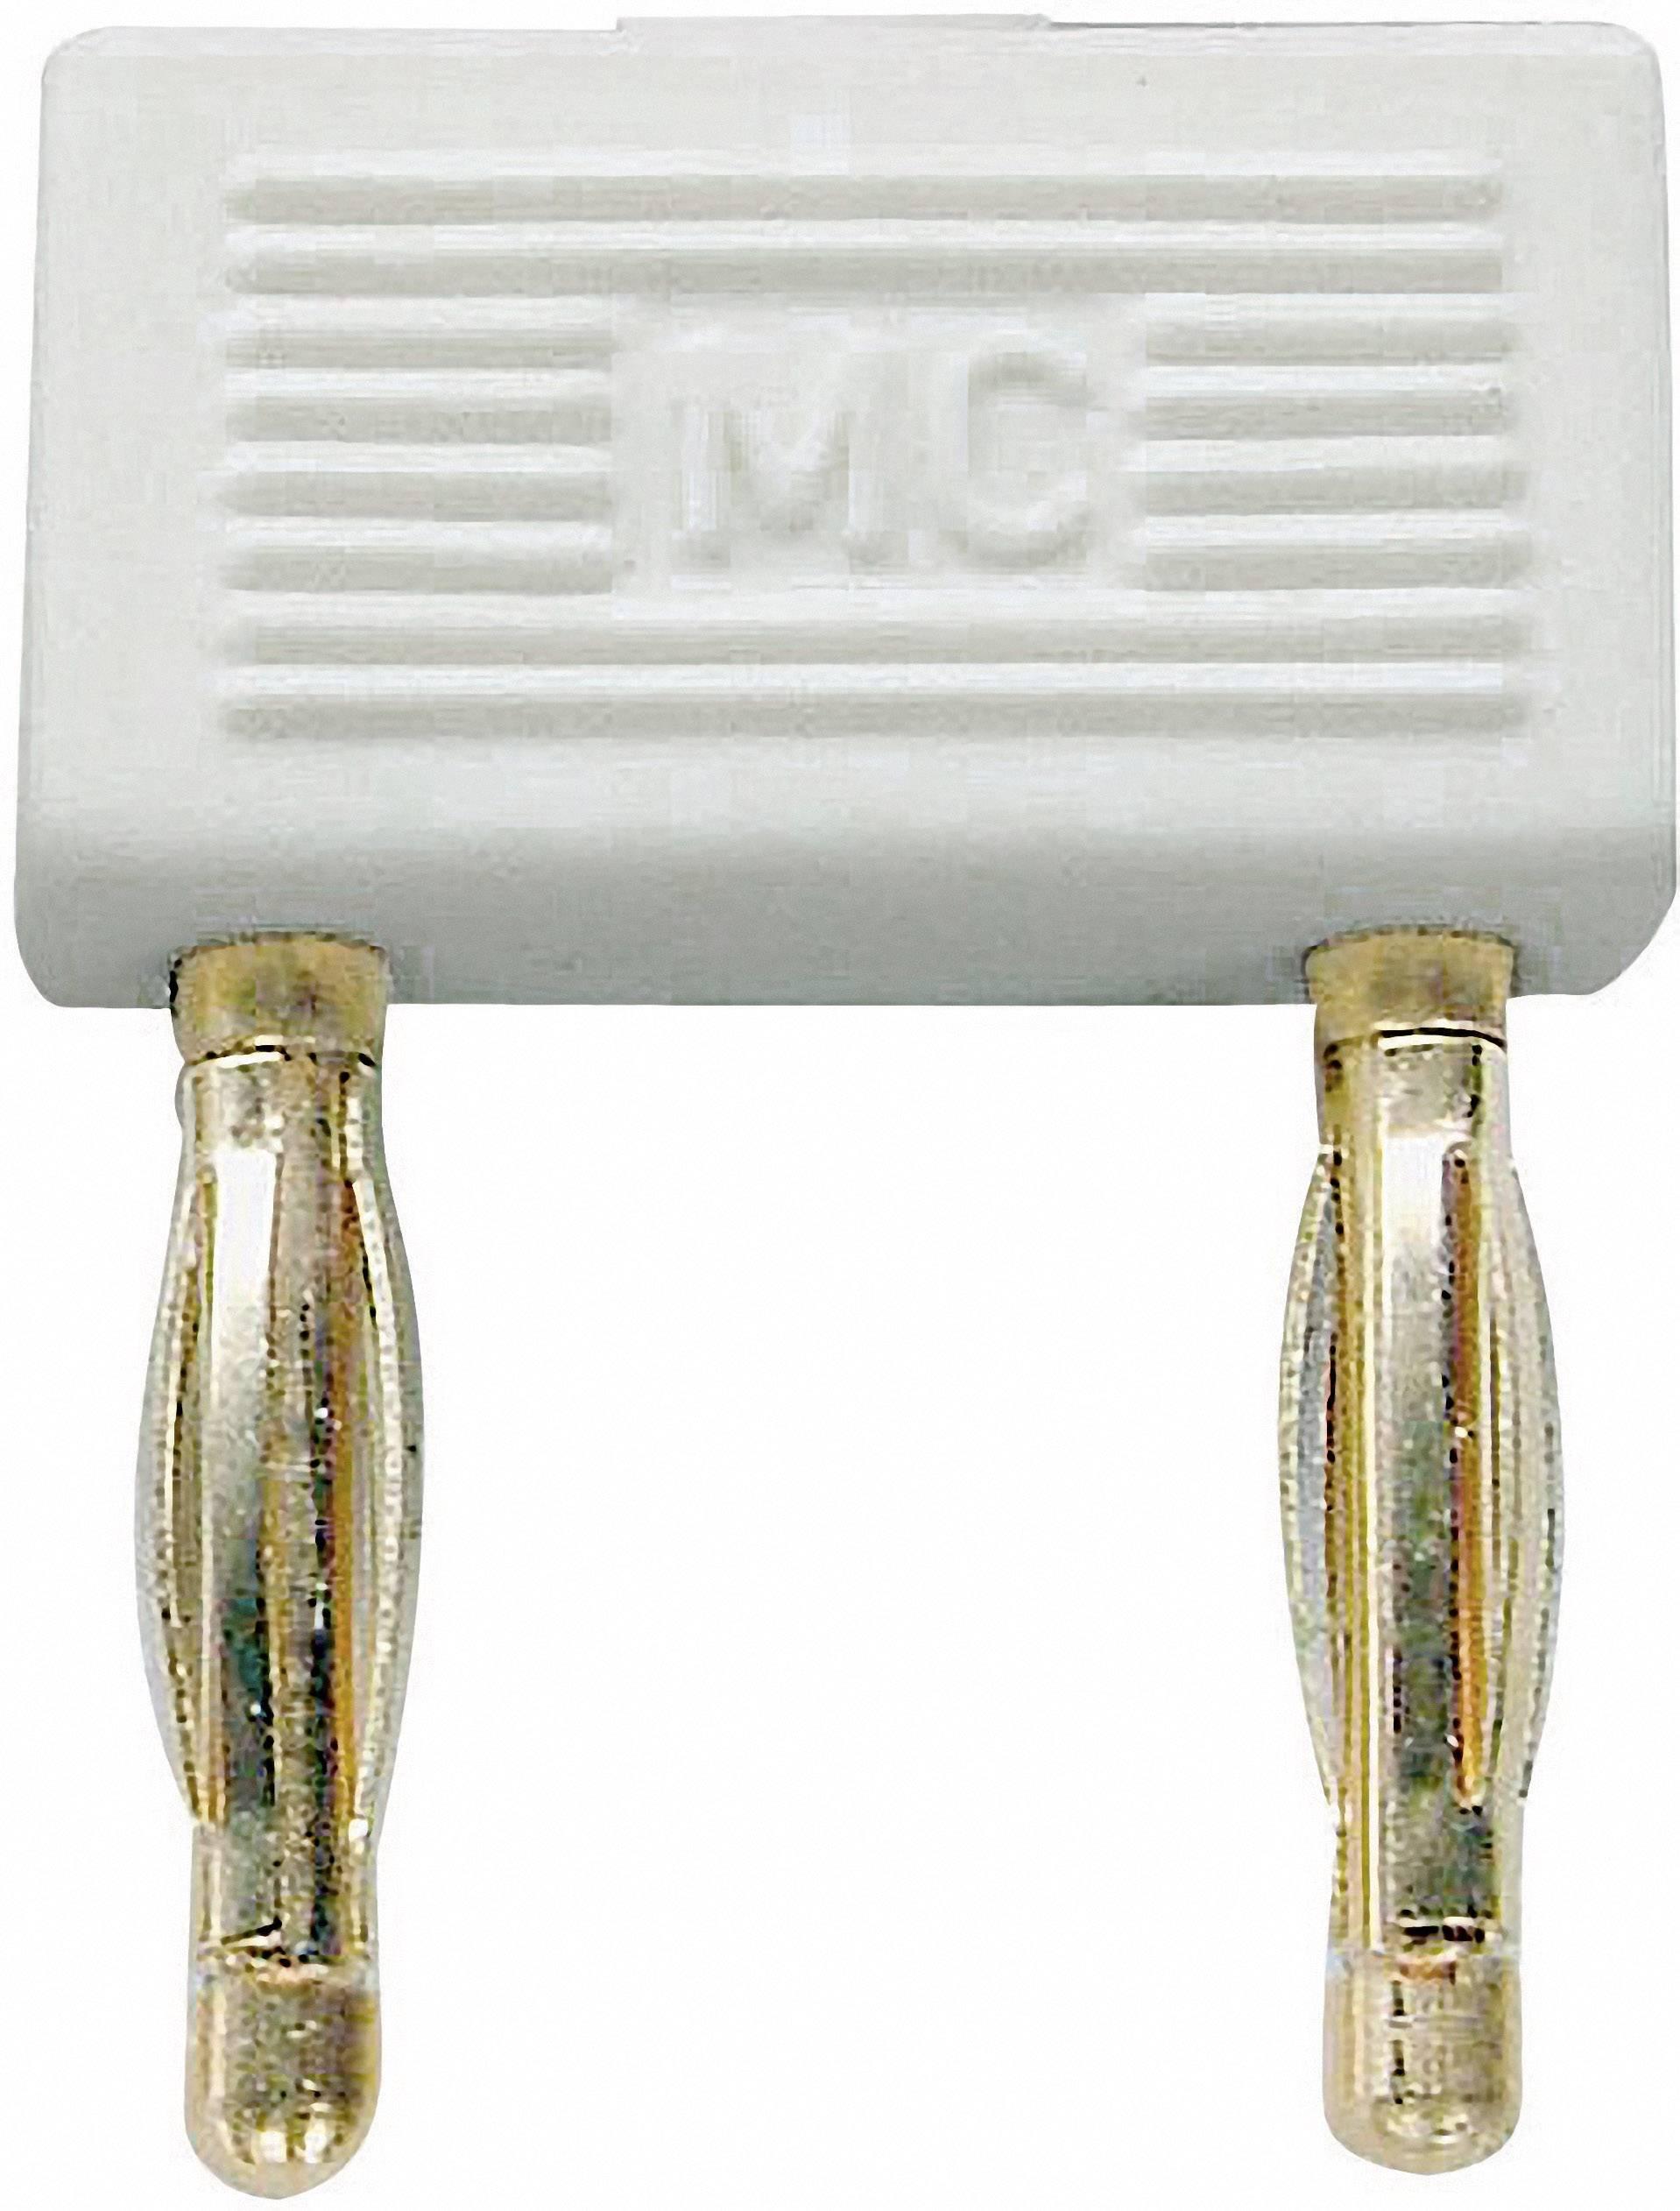 Propojovací konektor KS2